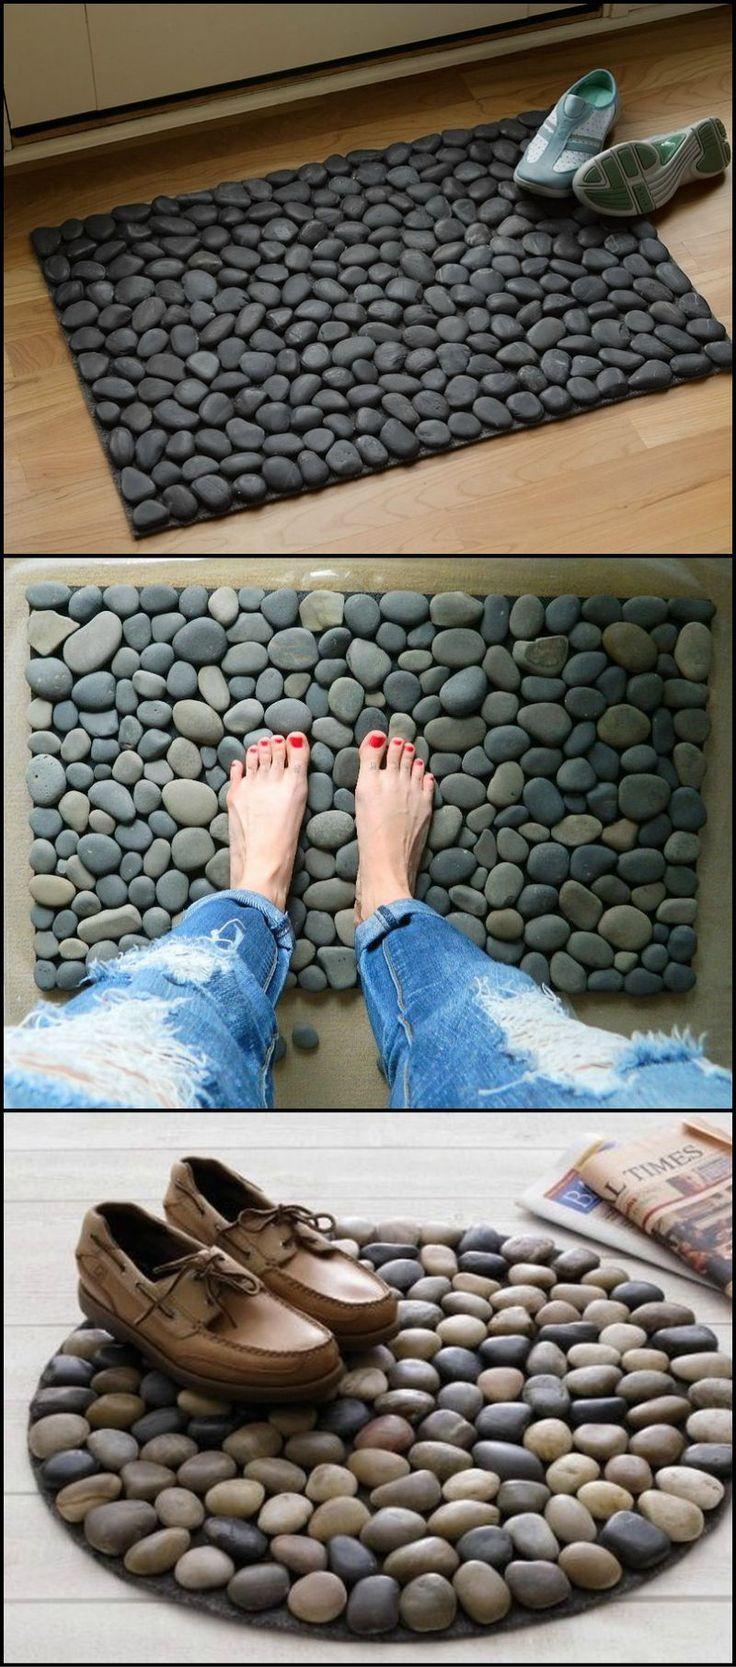 How To Make A Diy River Rock Doormat Diy River Rock River Rock Diy Home Decor